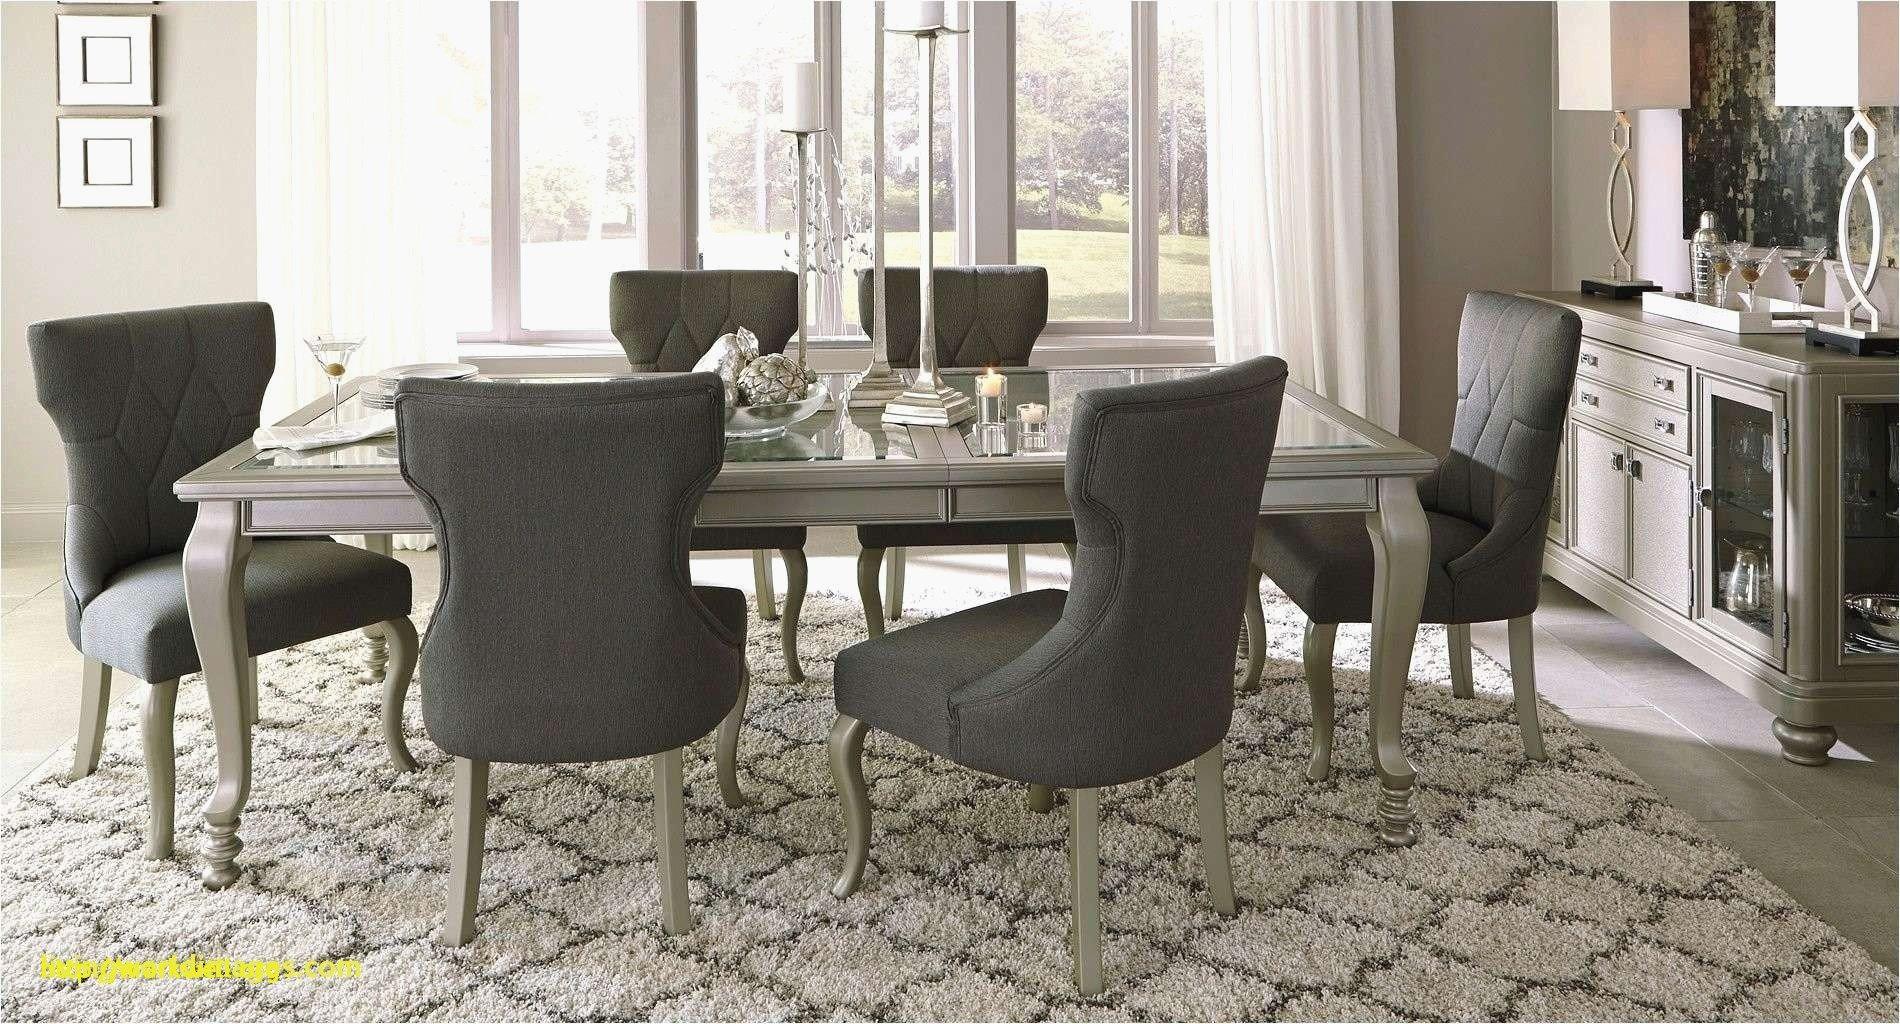 Value City Bedroom Furniture Luxury Inspirational Value City Living Room Furniture